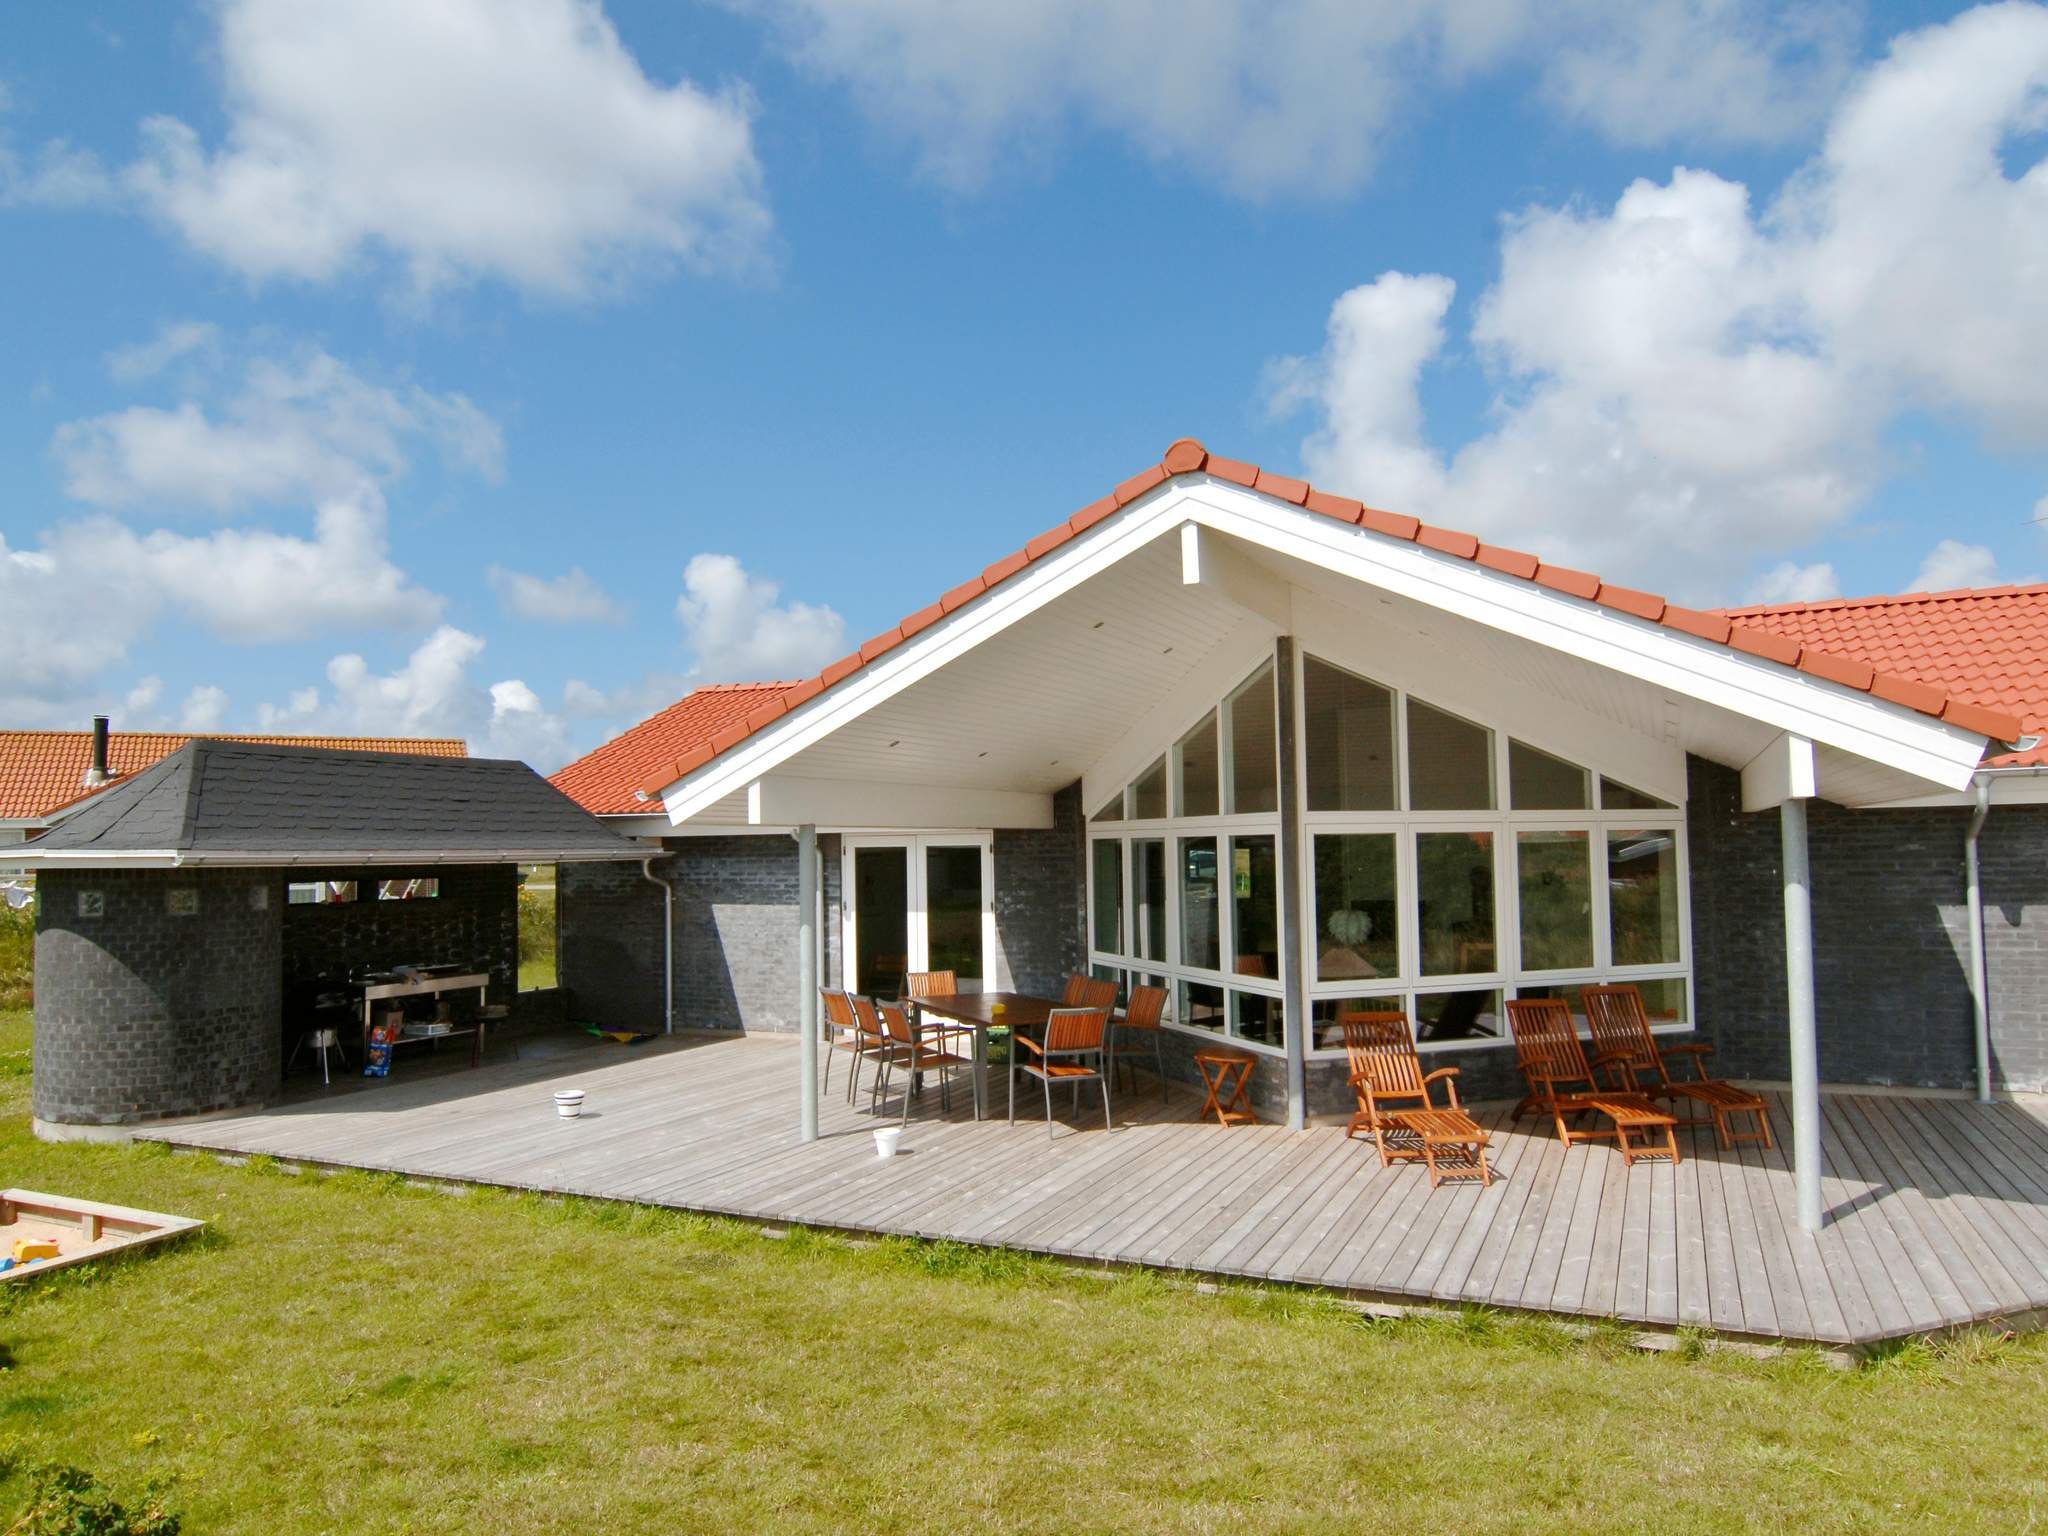 Ferienhaus Haurvig (125276), Hvide Sande, , Westjütland, Dänemark, Bild 21